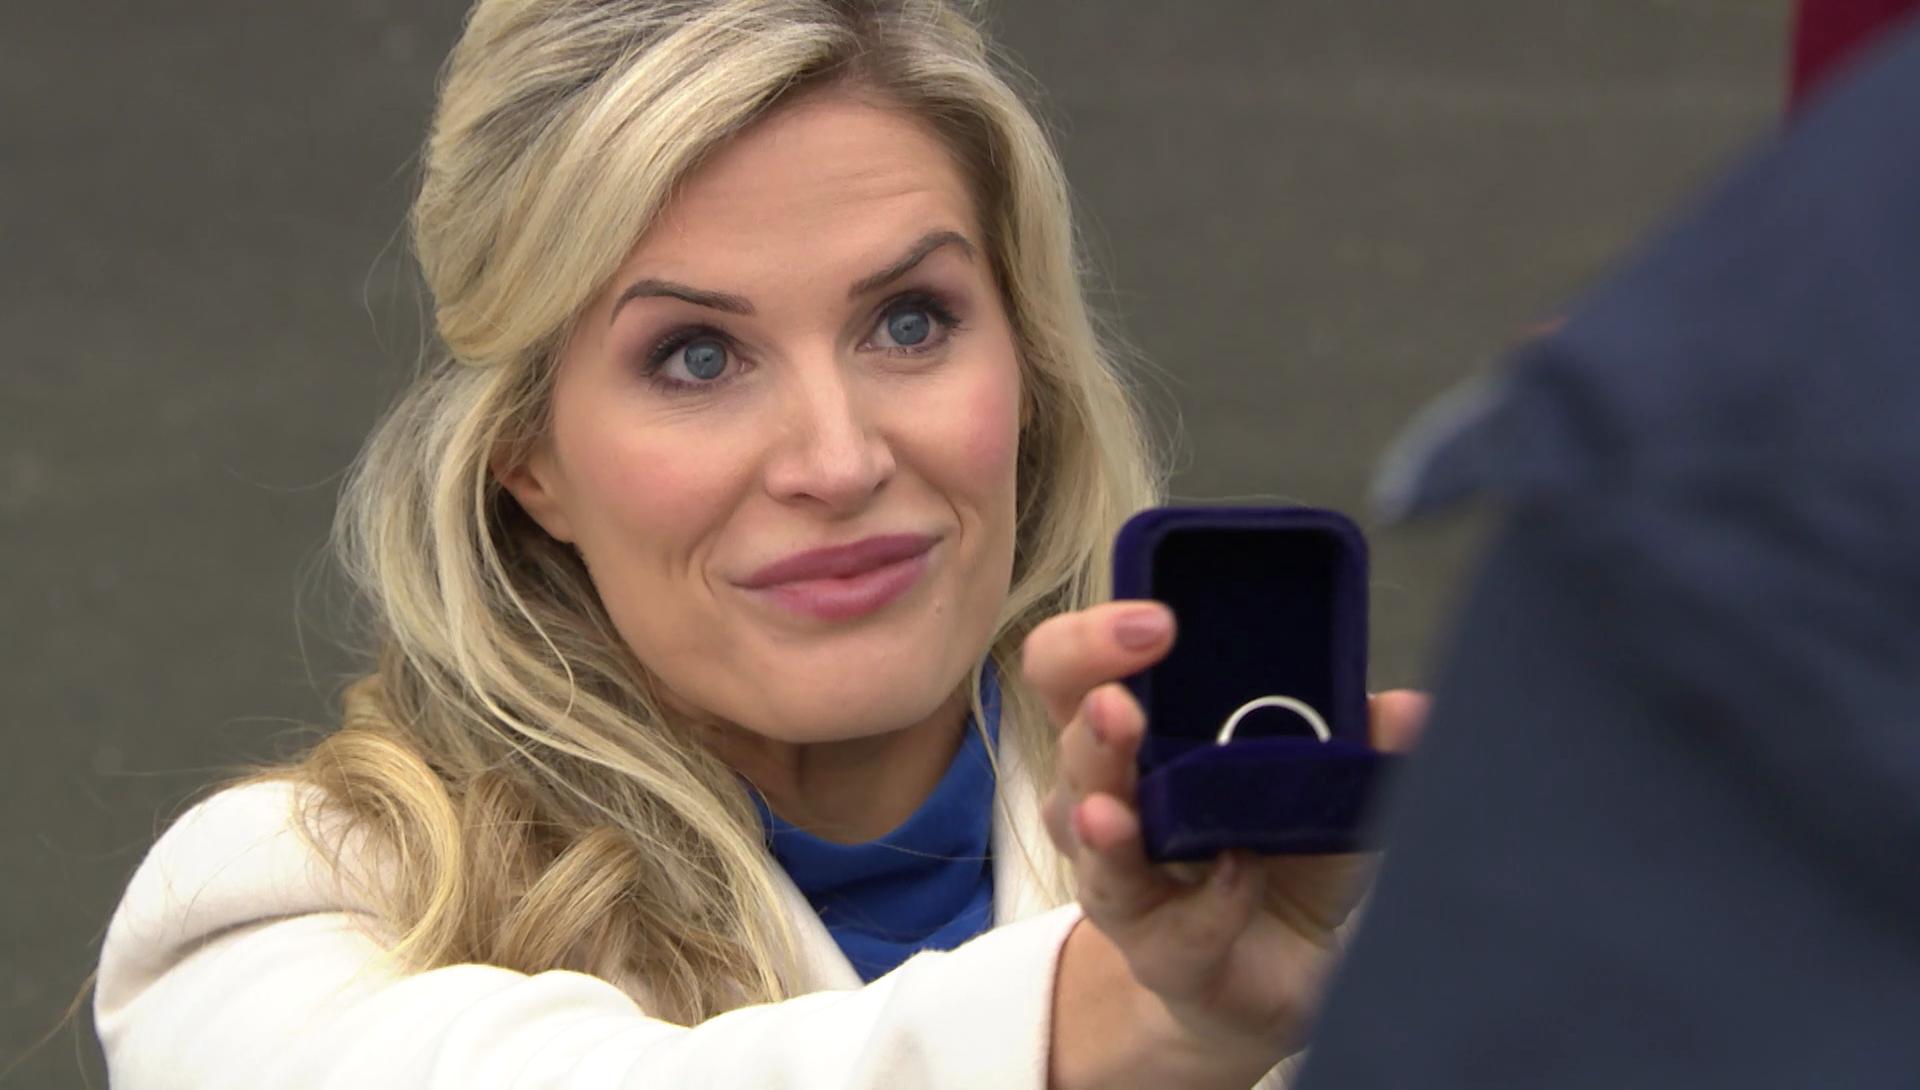 Mandy proposes